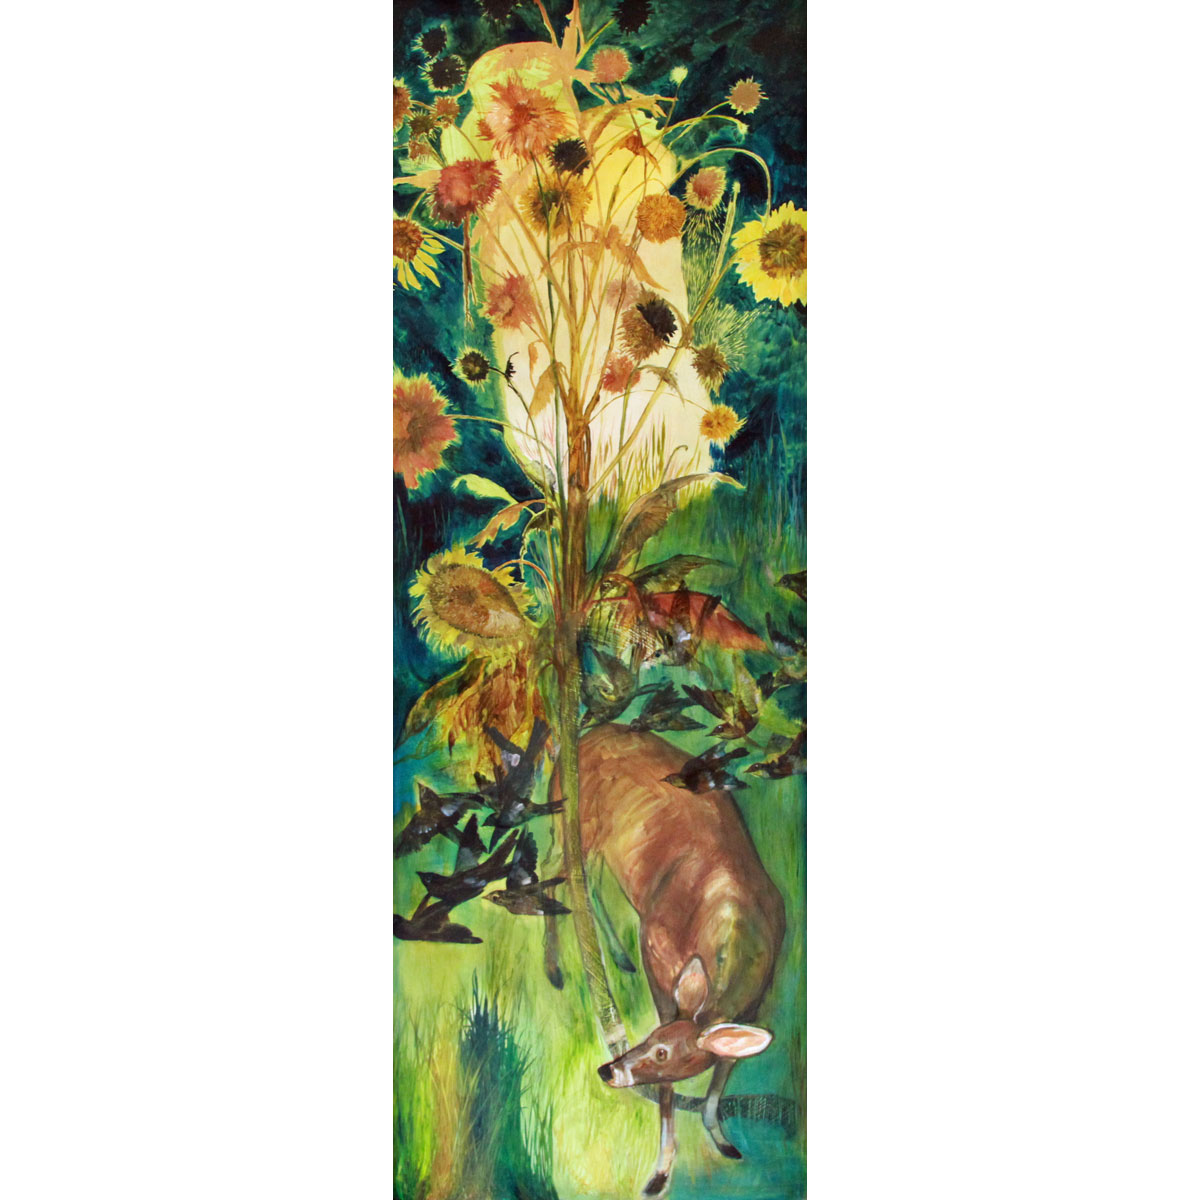 Sunflower Totem by Diane Kilgore Condon